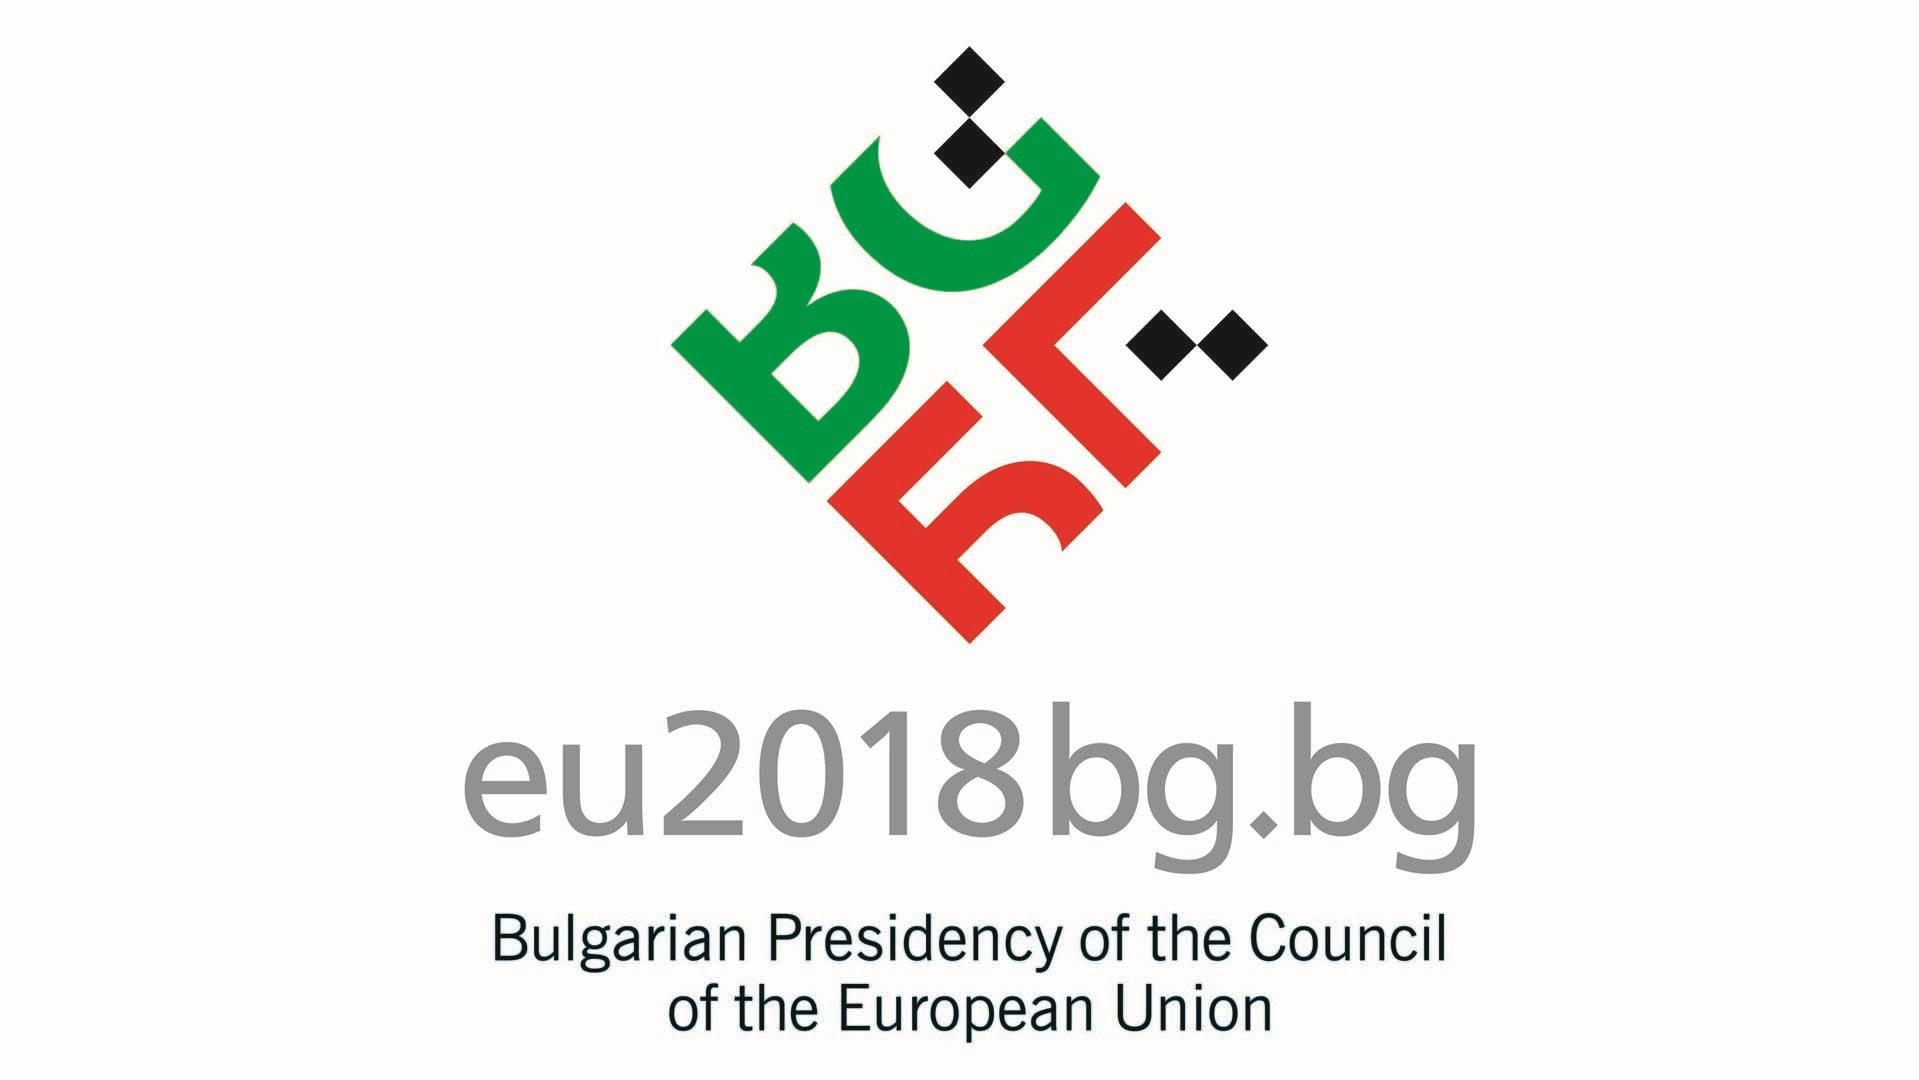 「bulgarian presidency of the eu」的圖片搜尋結果